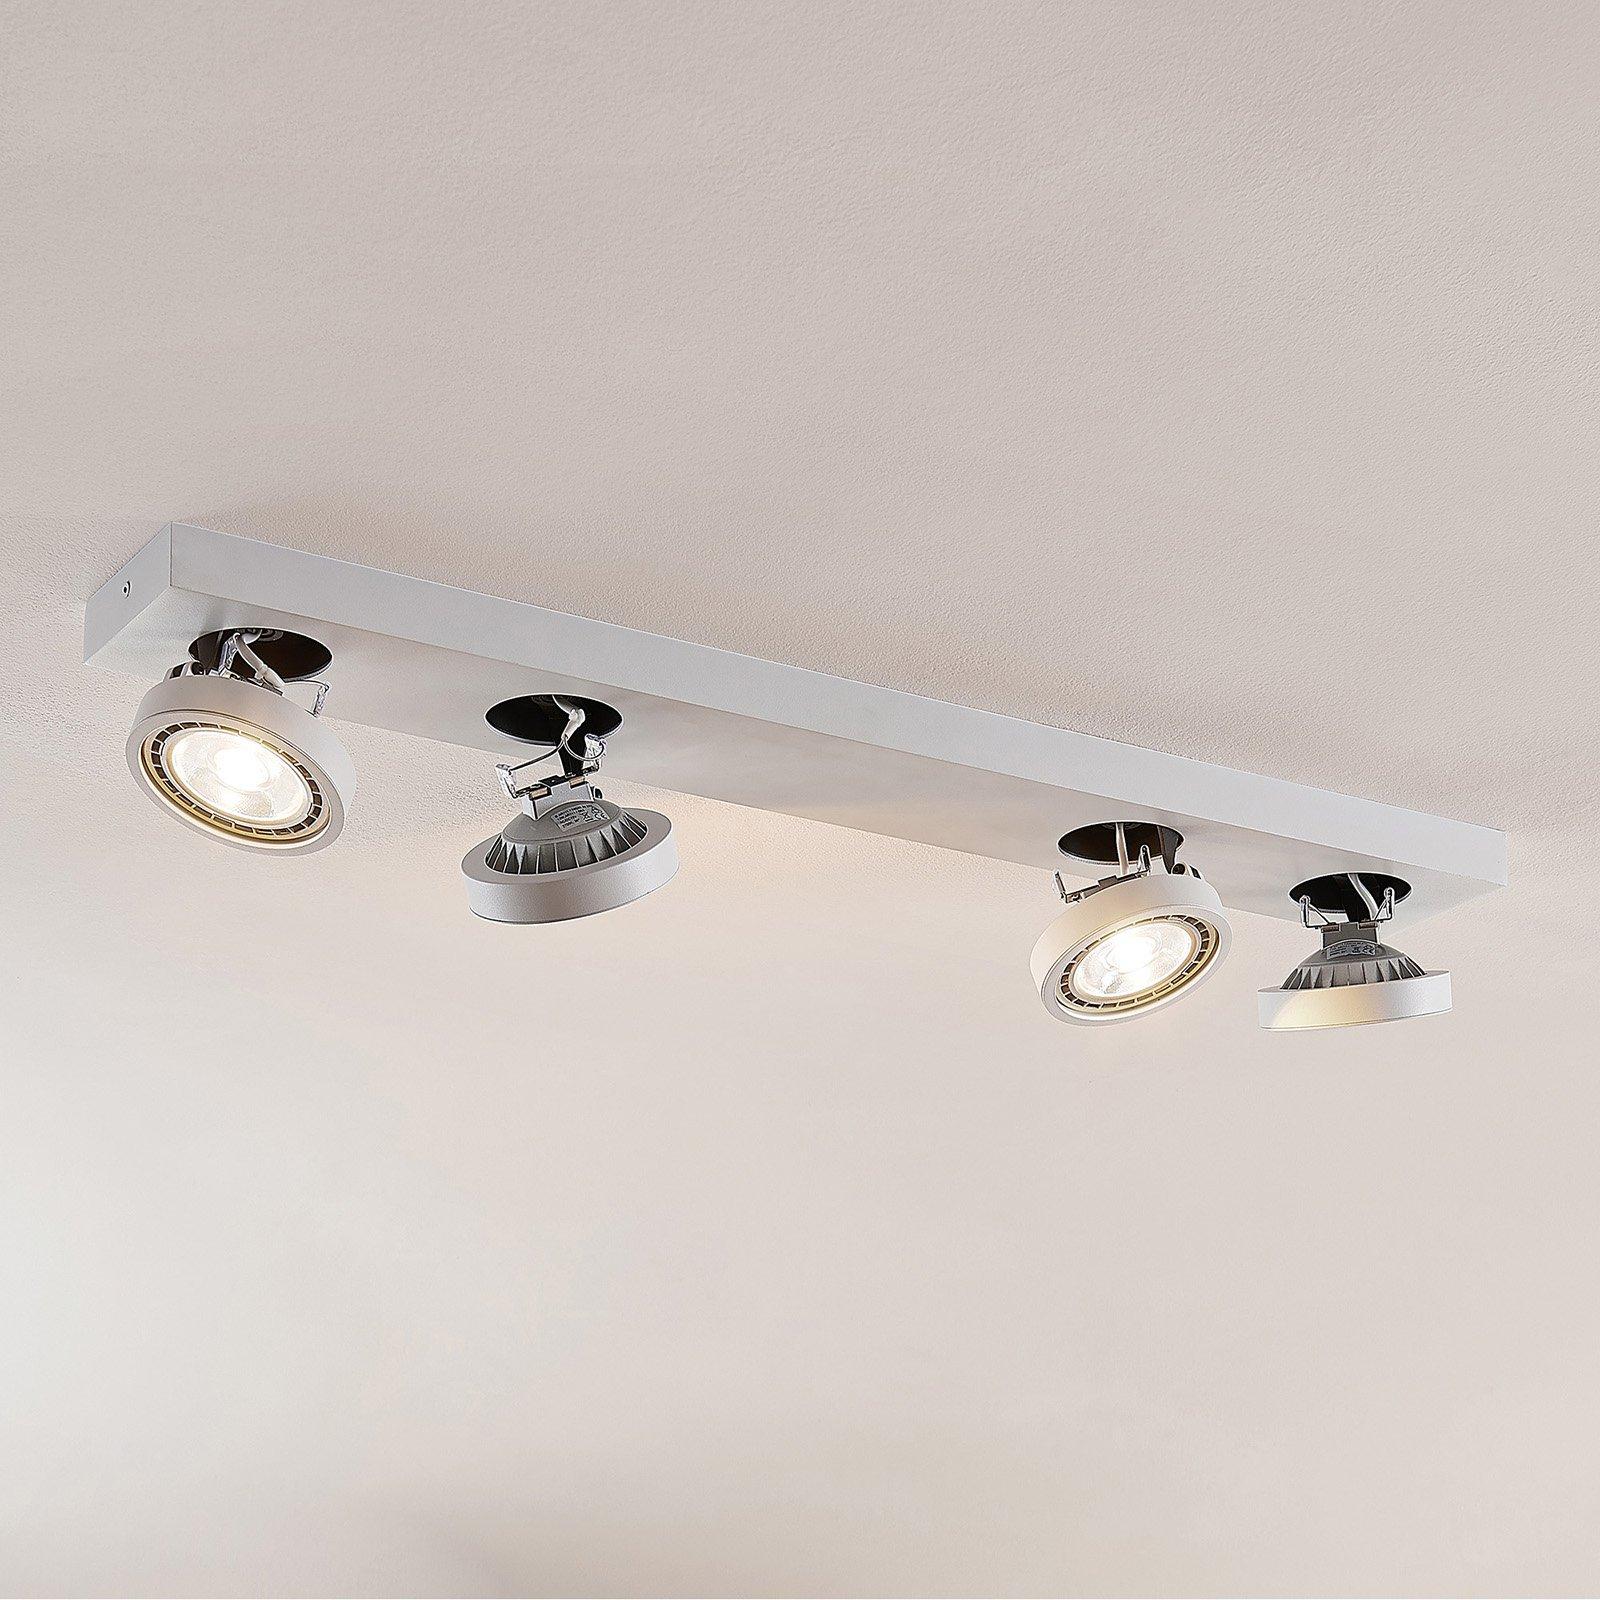 LED-taklampe Negan i hvit, 4 lyskilder